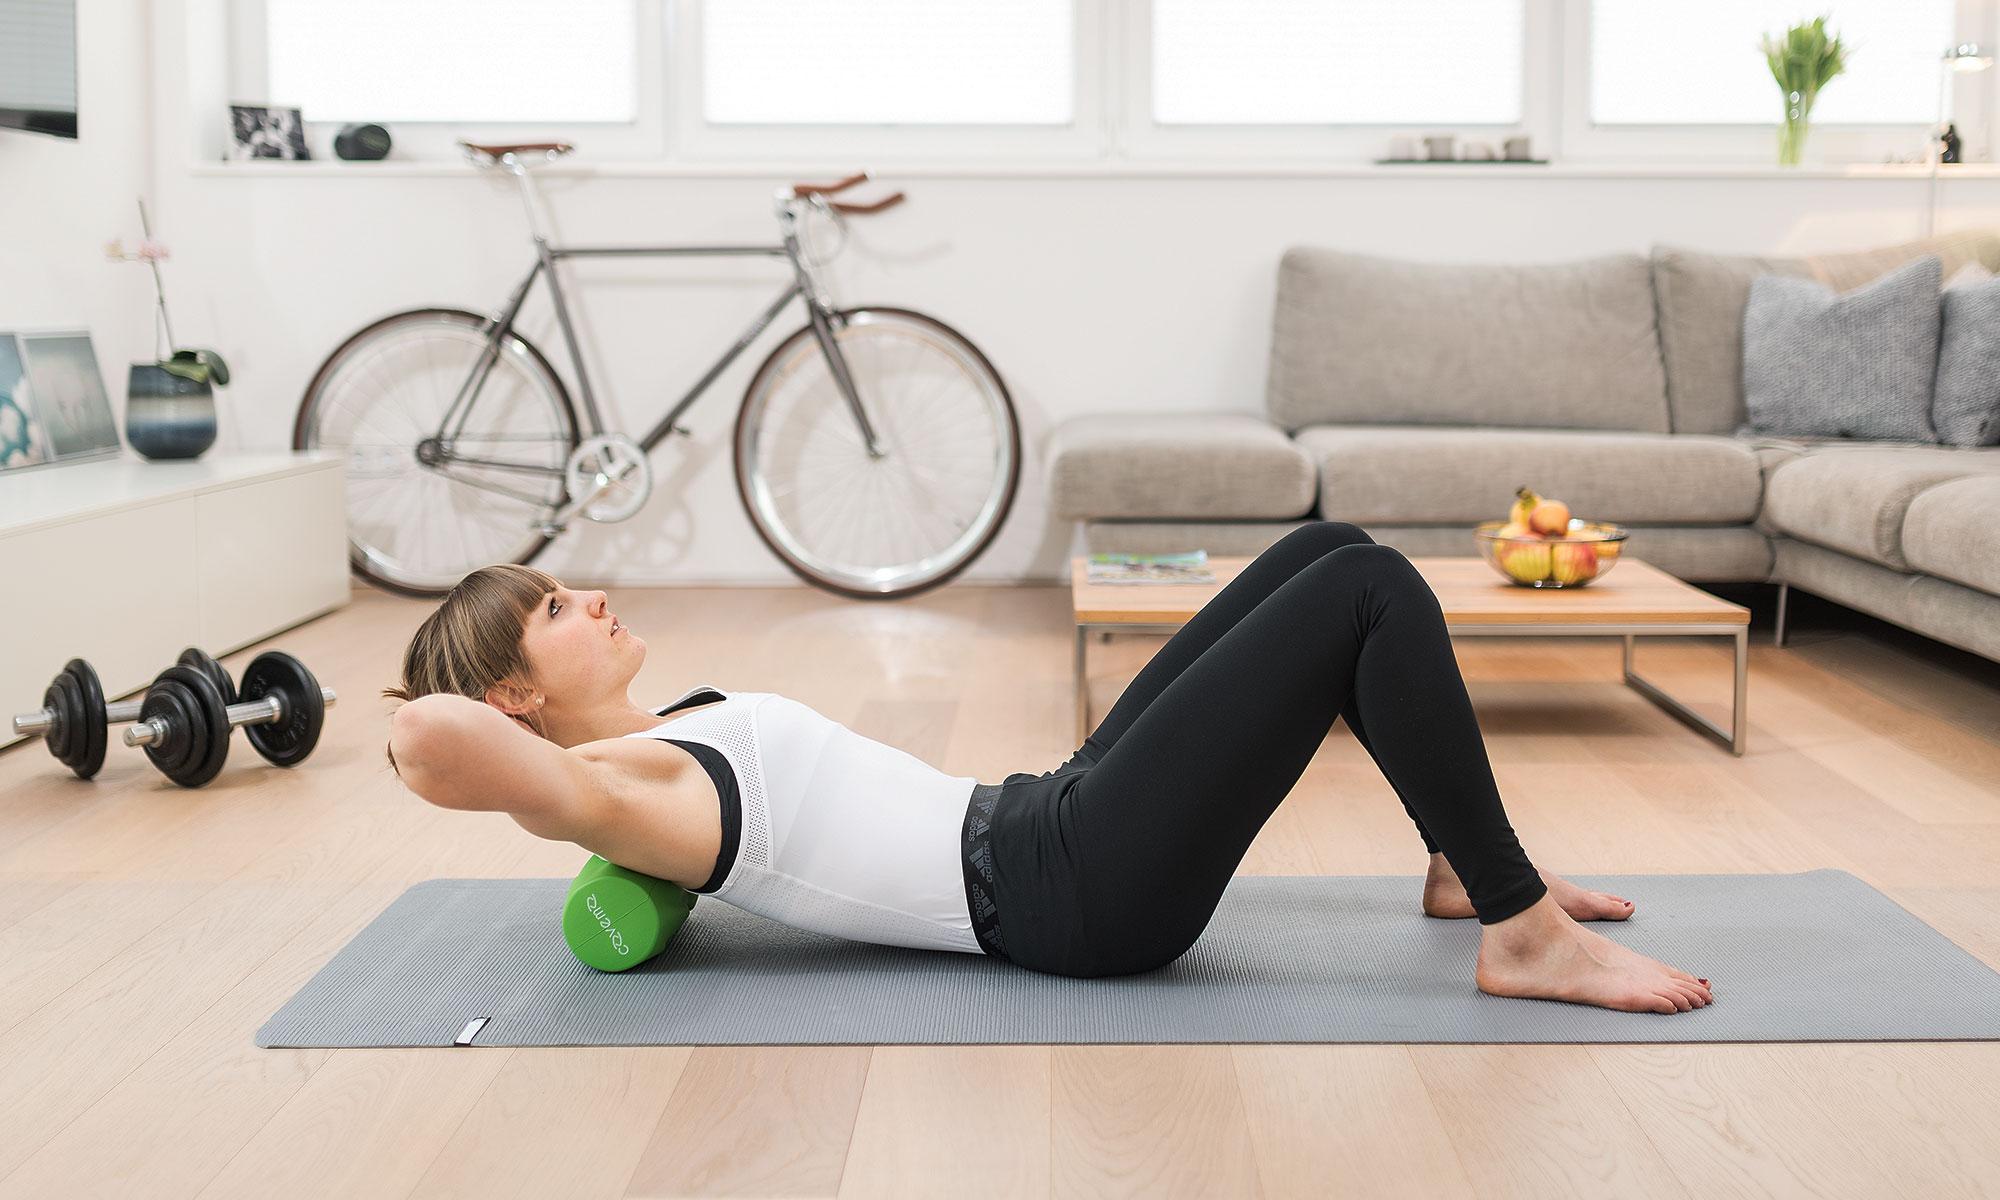 COVEMO® • Covemove Basic Übung für die Brustwirbelsäule